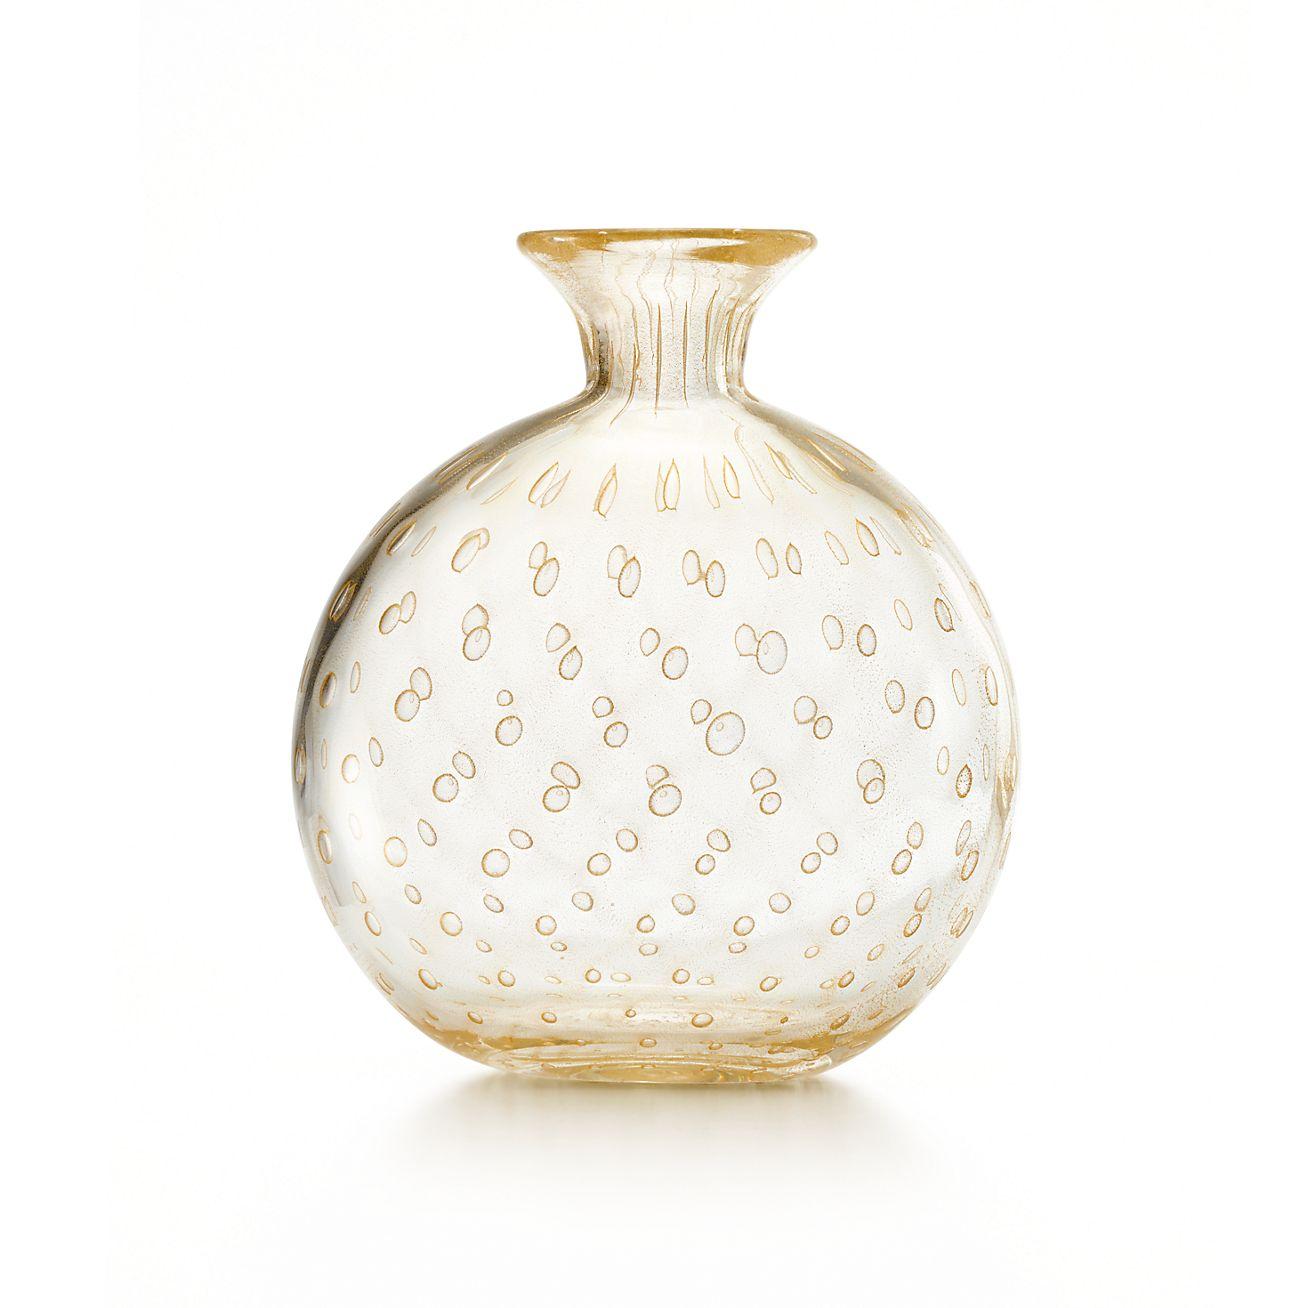 Bullicante vase in handmade mouth blown venetian glass with 24k bullicante vase bullicante vase reviewsmspy